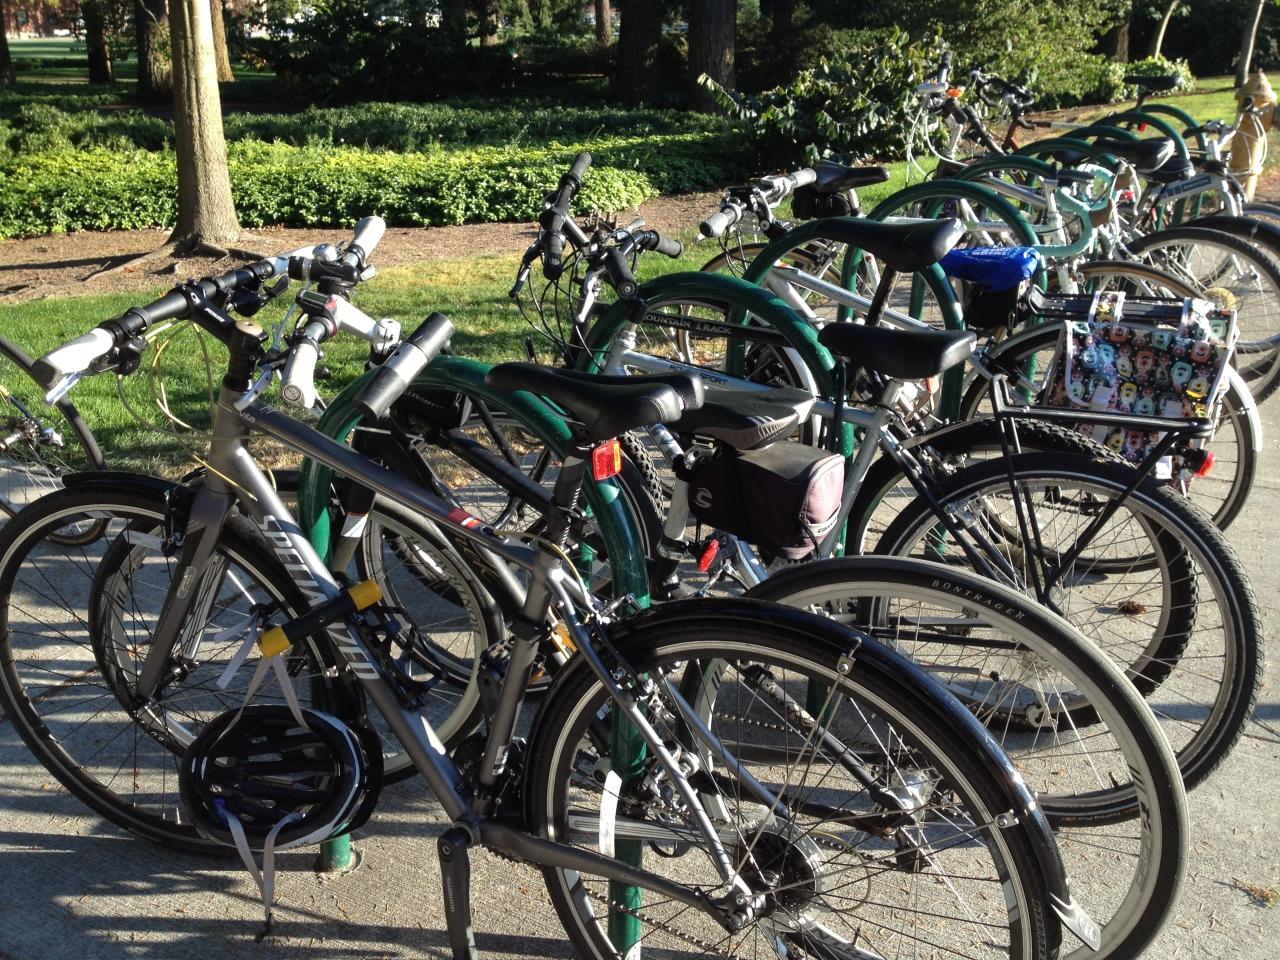 'U' Shape bike rack